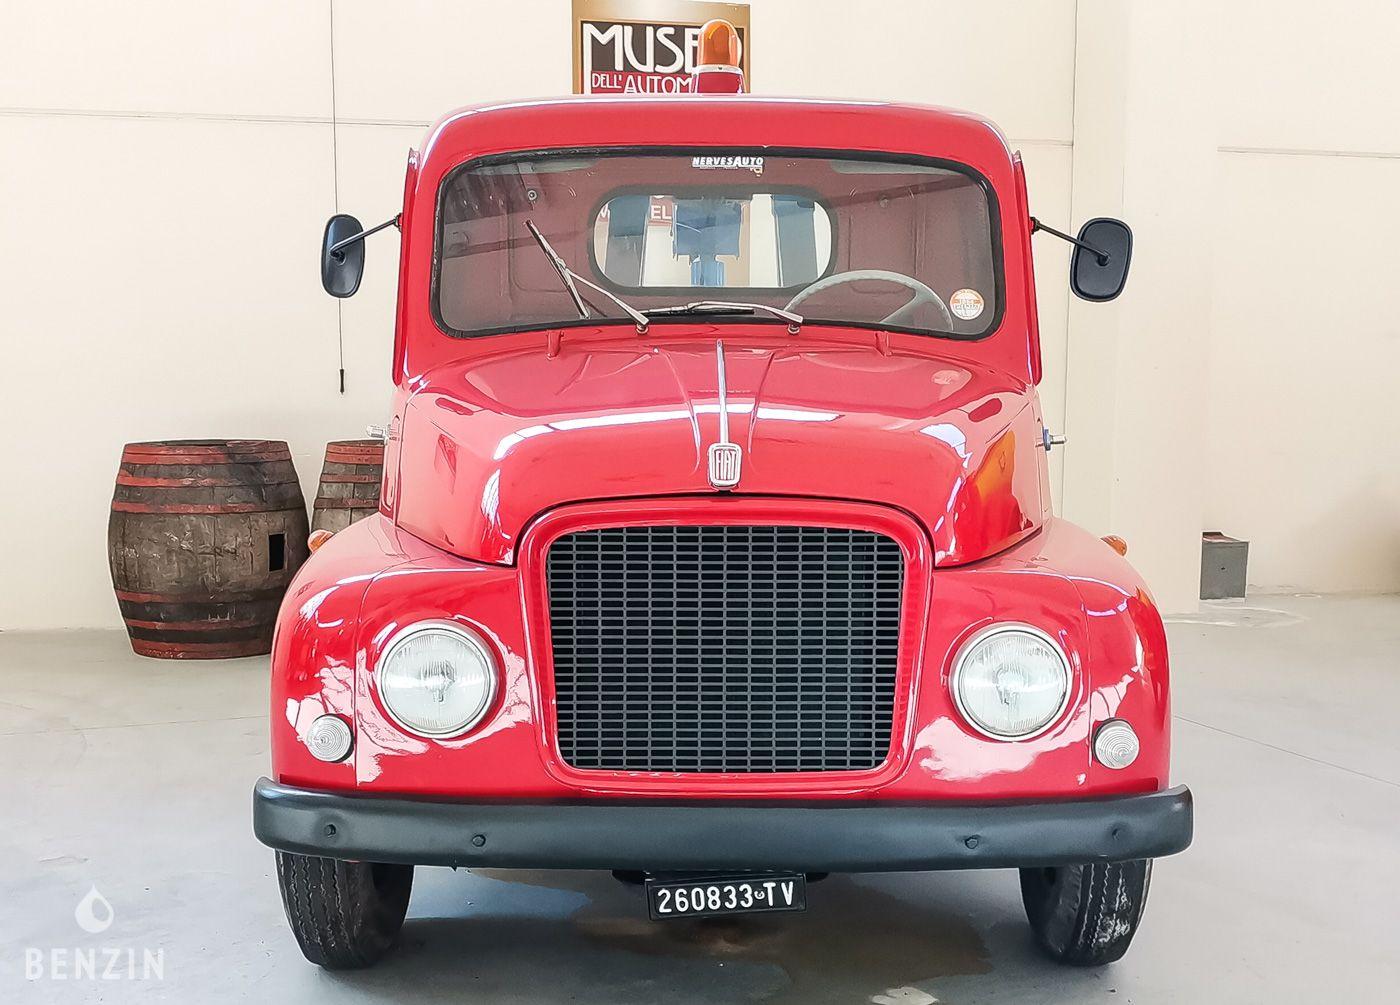 Fiat 615N a vendreFiat 615N to sell/ Fiat 615N verkaufen/ Fiat 615N en venta